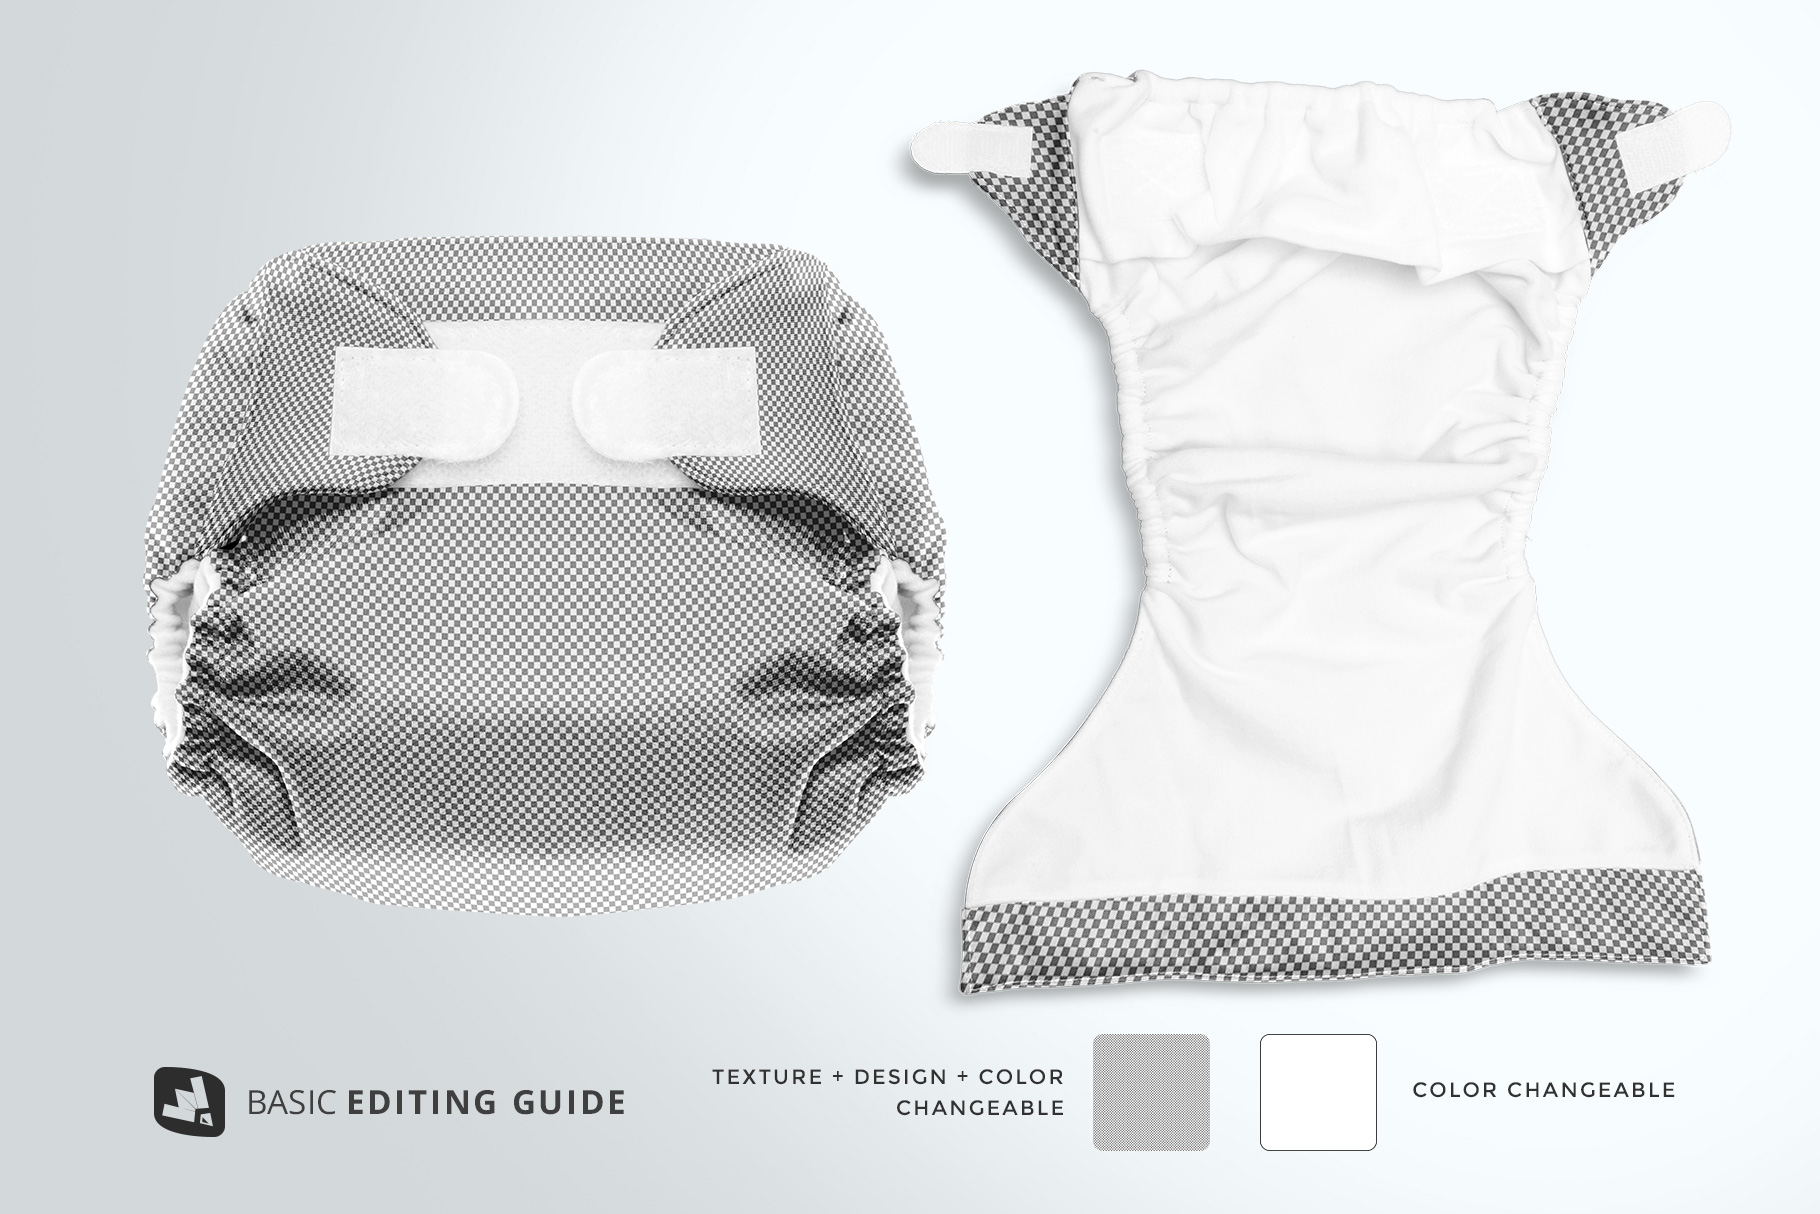 editability of the reusable velcro cloth diaper mockup